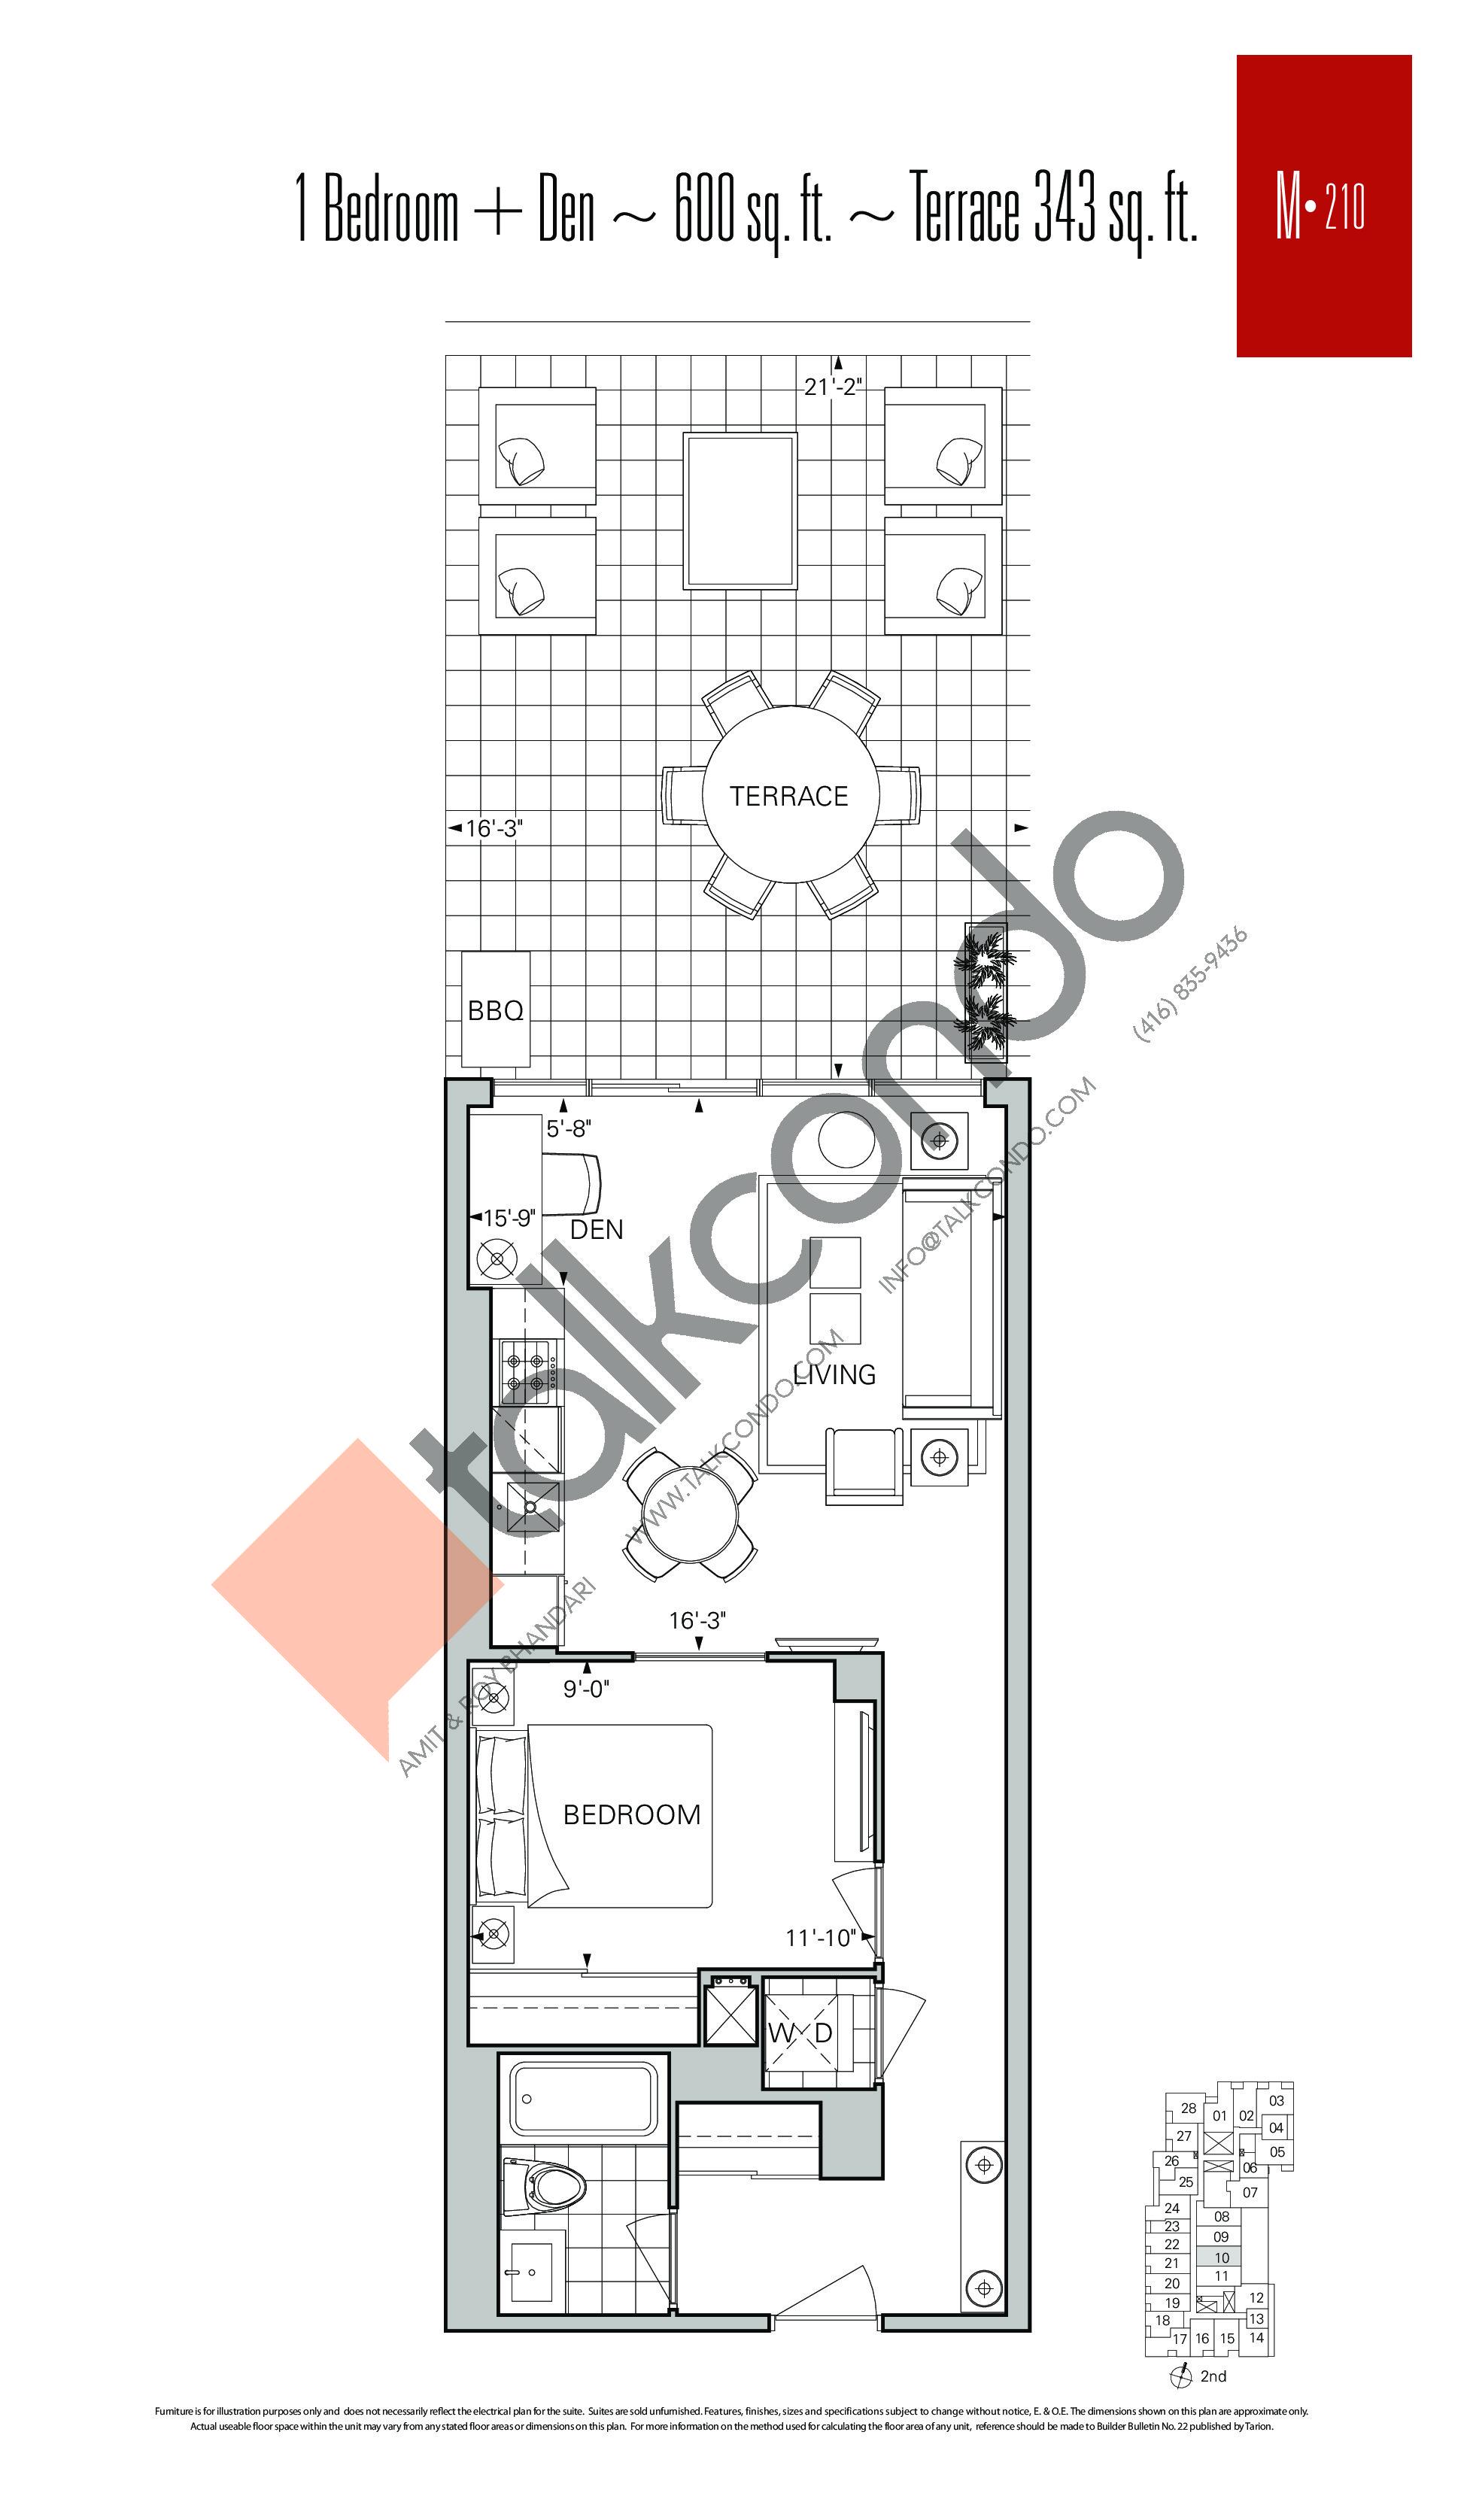 M-210 Floor Plan at Rise Condos - 600 sq.ft